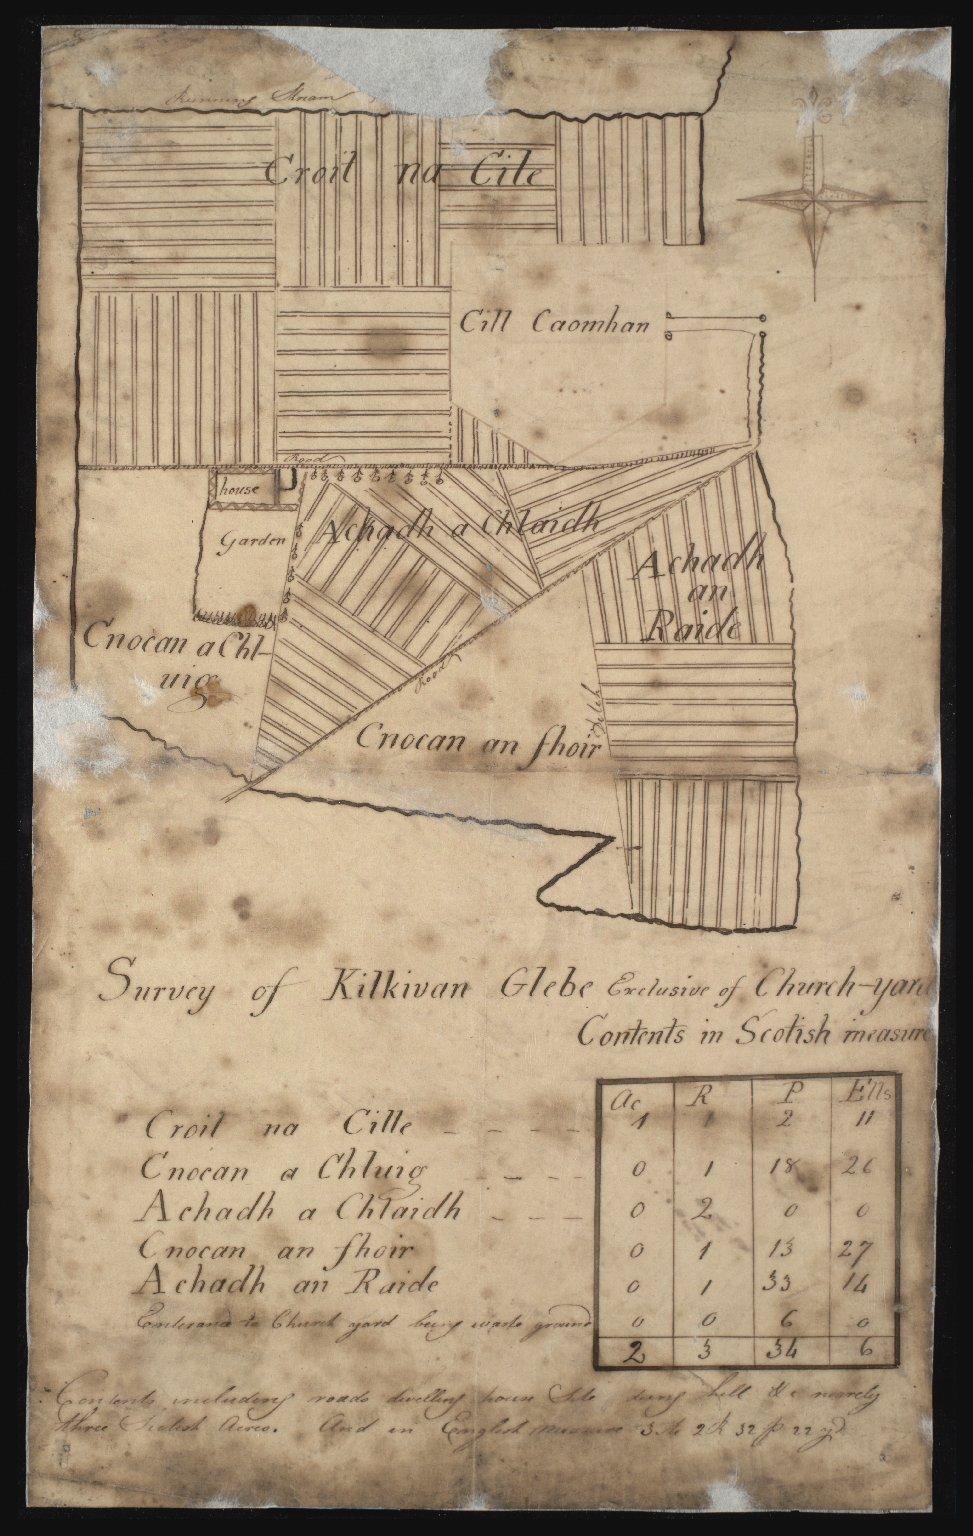 Survey of Kilkivan Glebe Exclusive of Church Yard [1 of 1]